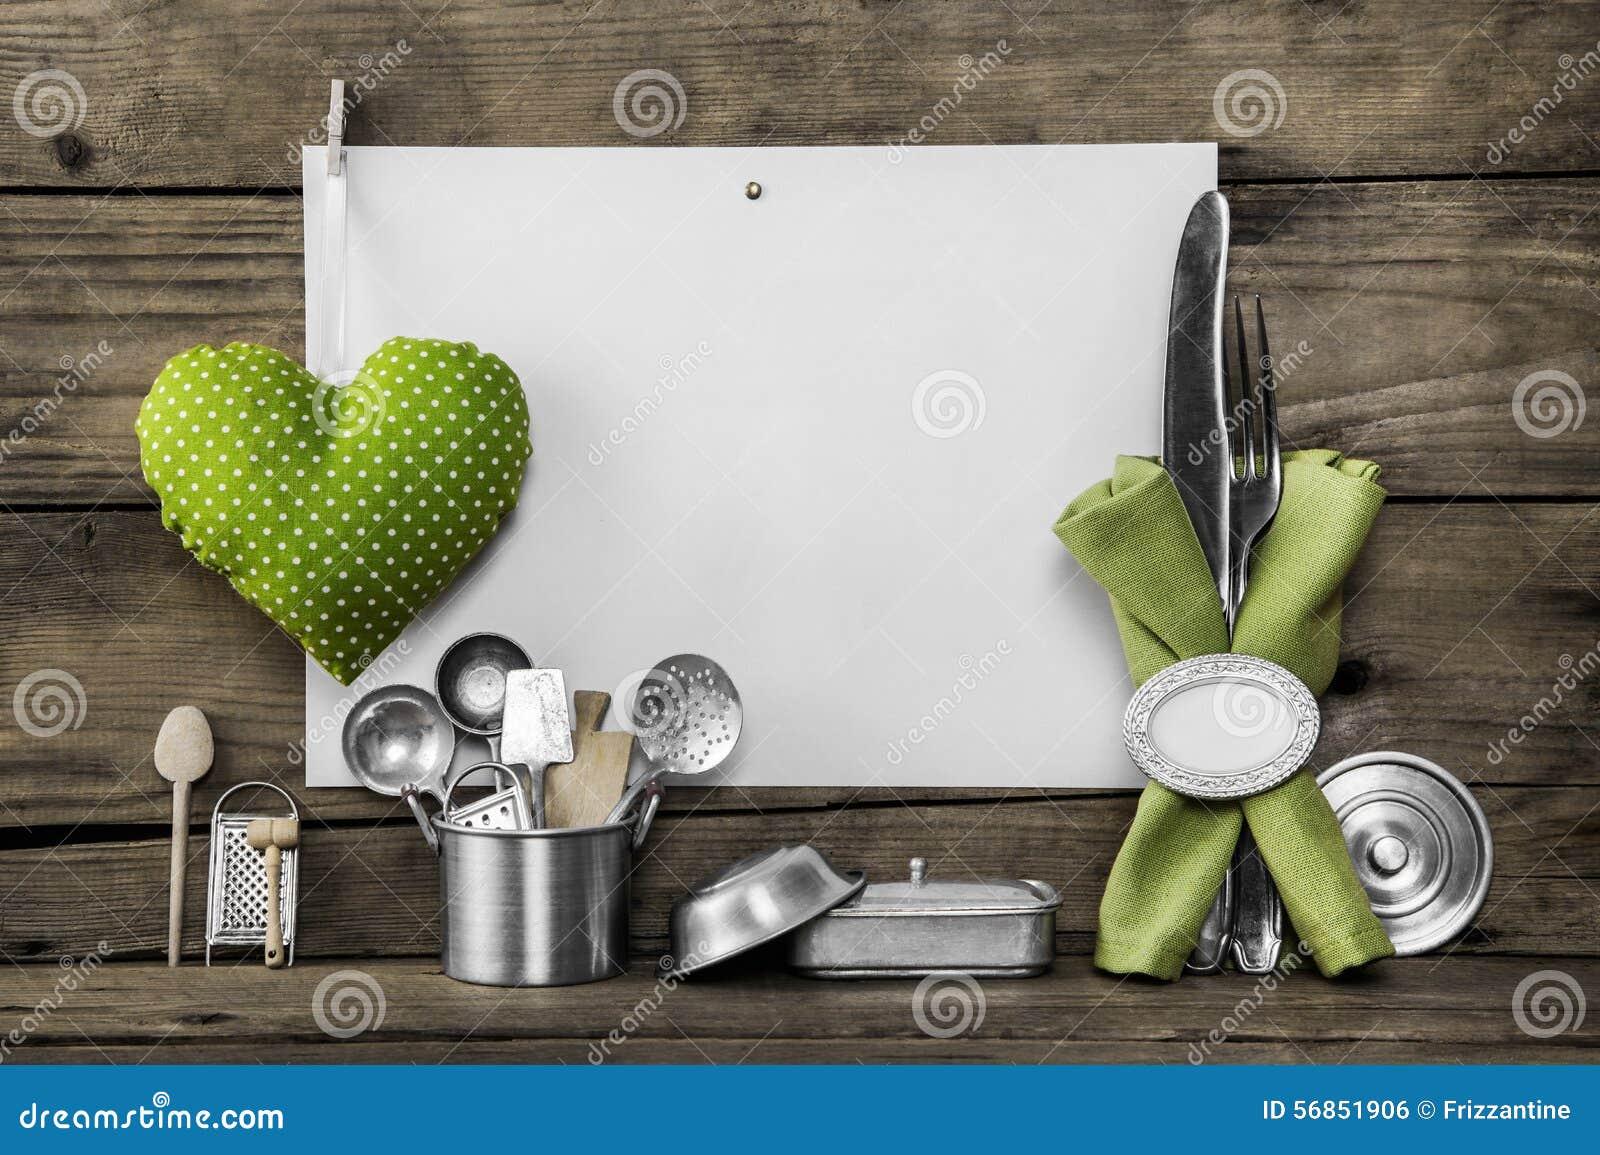 top cuisine vert pomme et blanc cuisine vert et marron tendance with meuble cuisine vert pomme. Black Bedroom Furniture Sets. Home Design Ideas